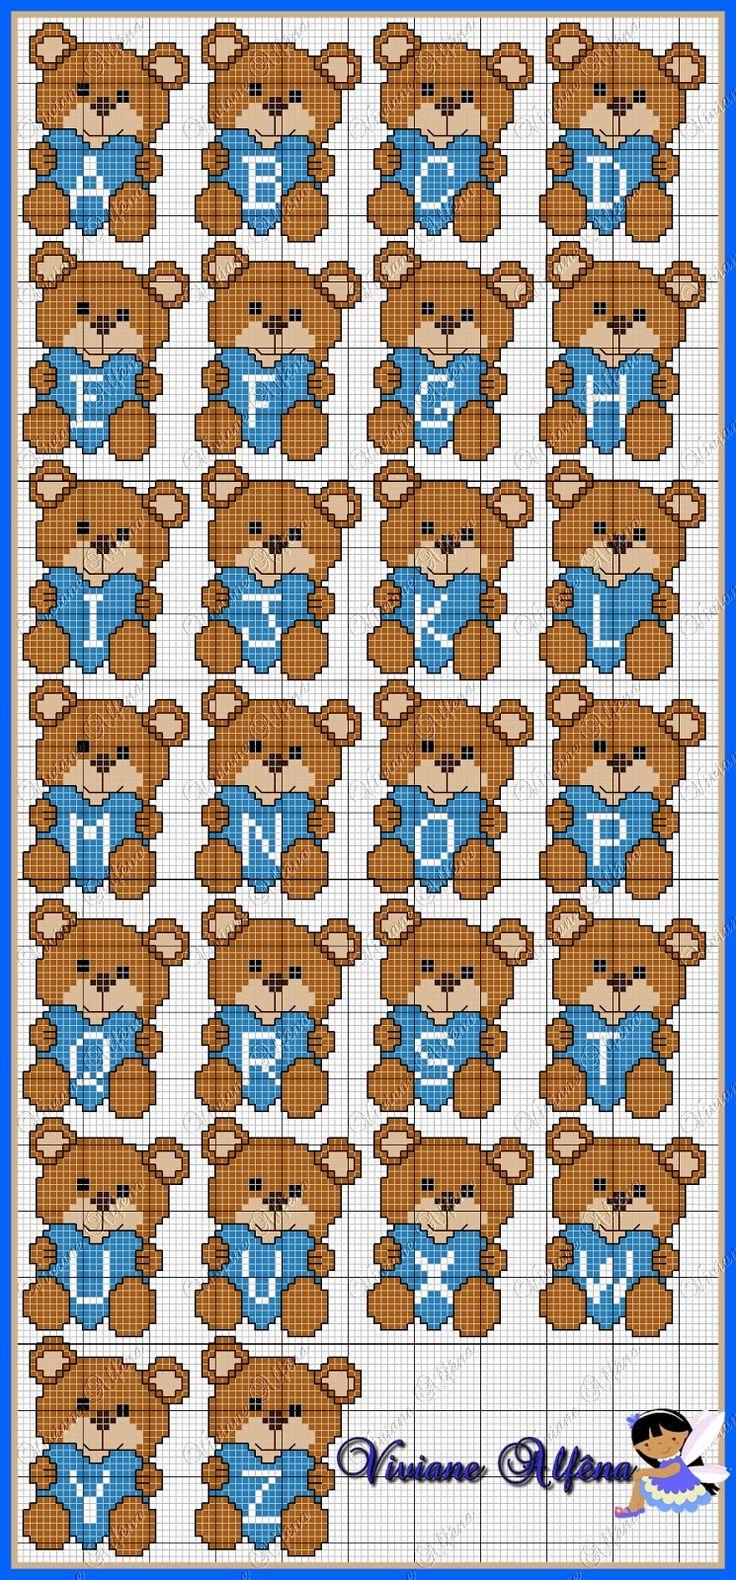 Viviane Alfêna: Mono Ursinhos Amorosos